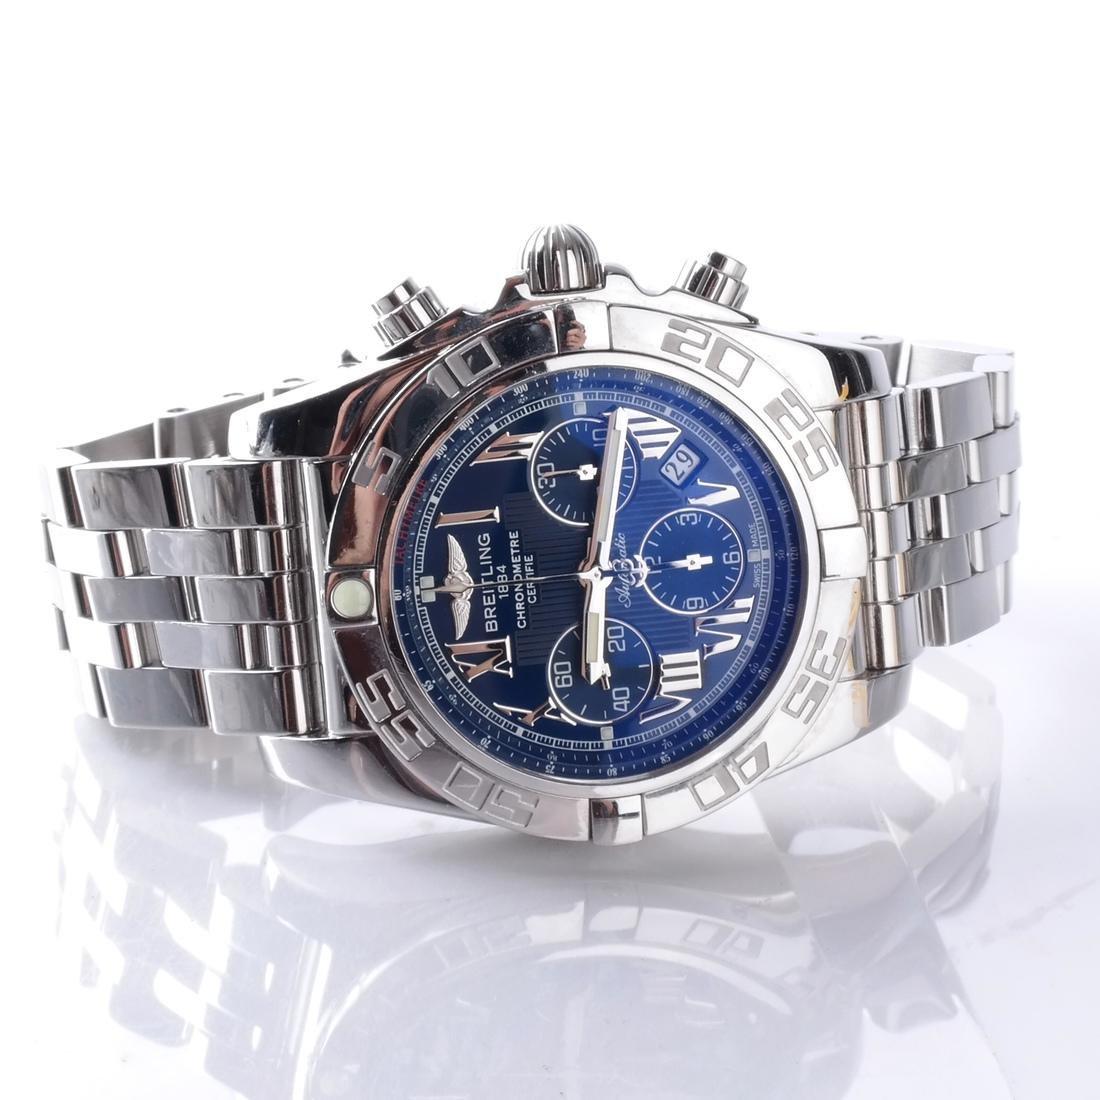 Breitling Chronomat AB0110 - 3